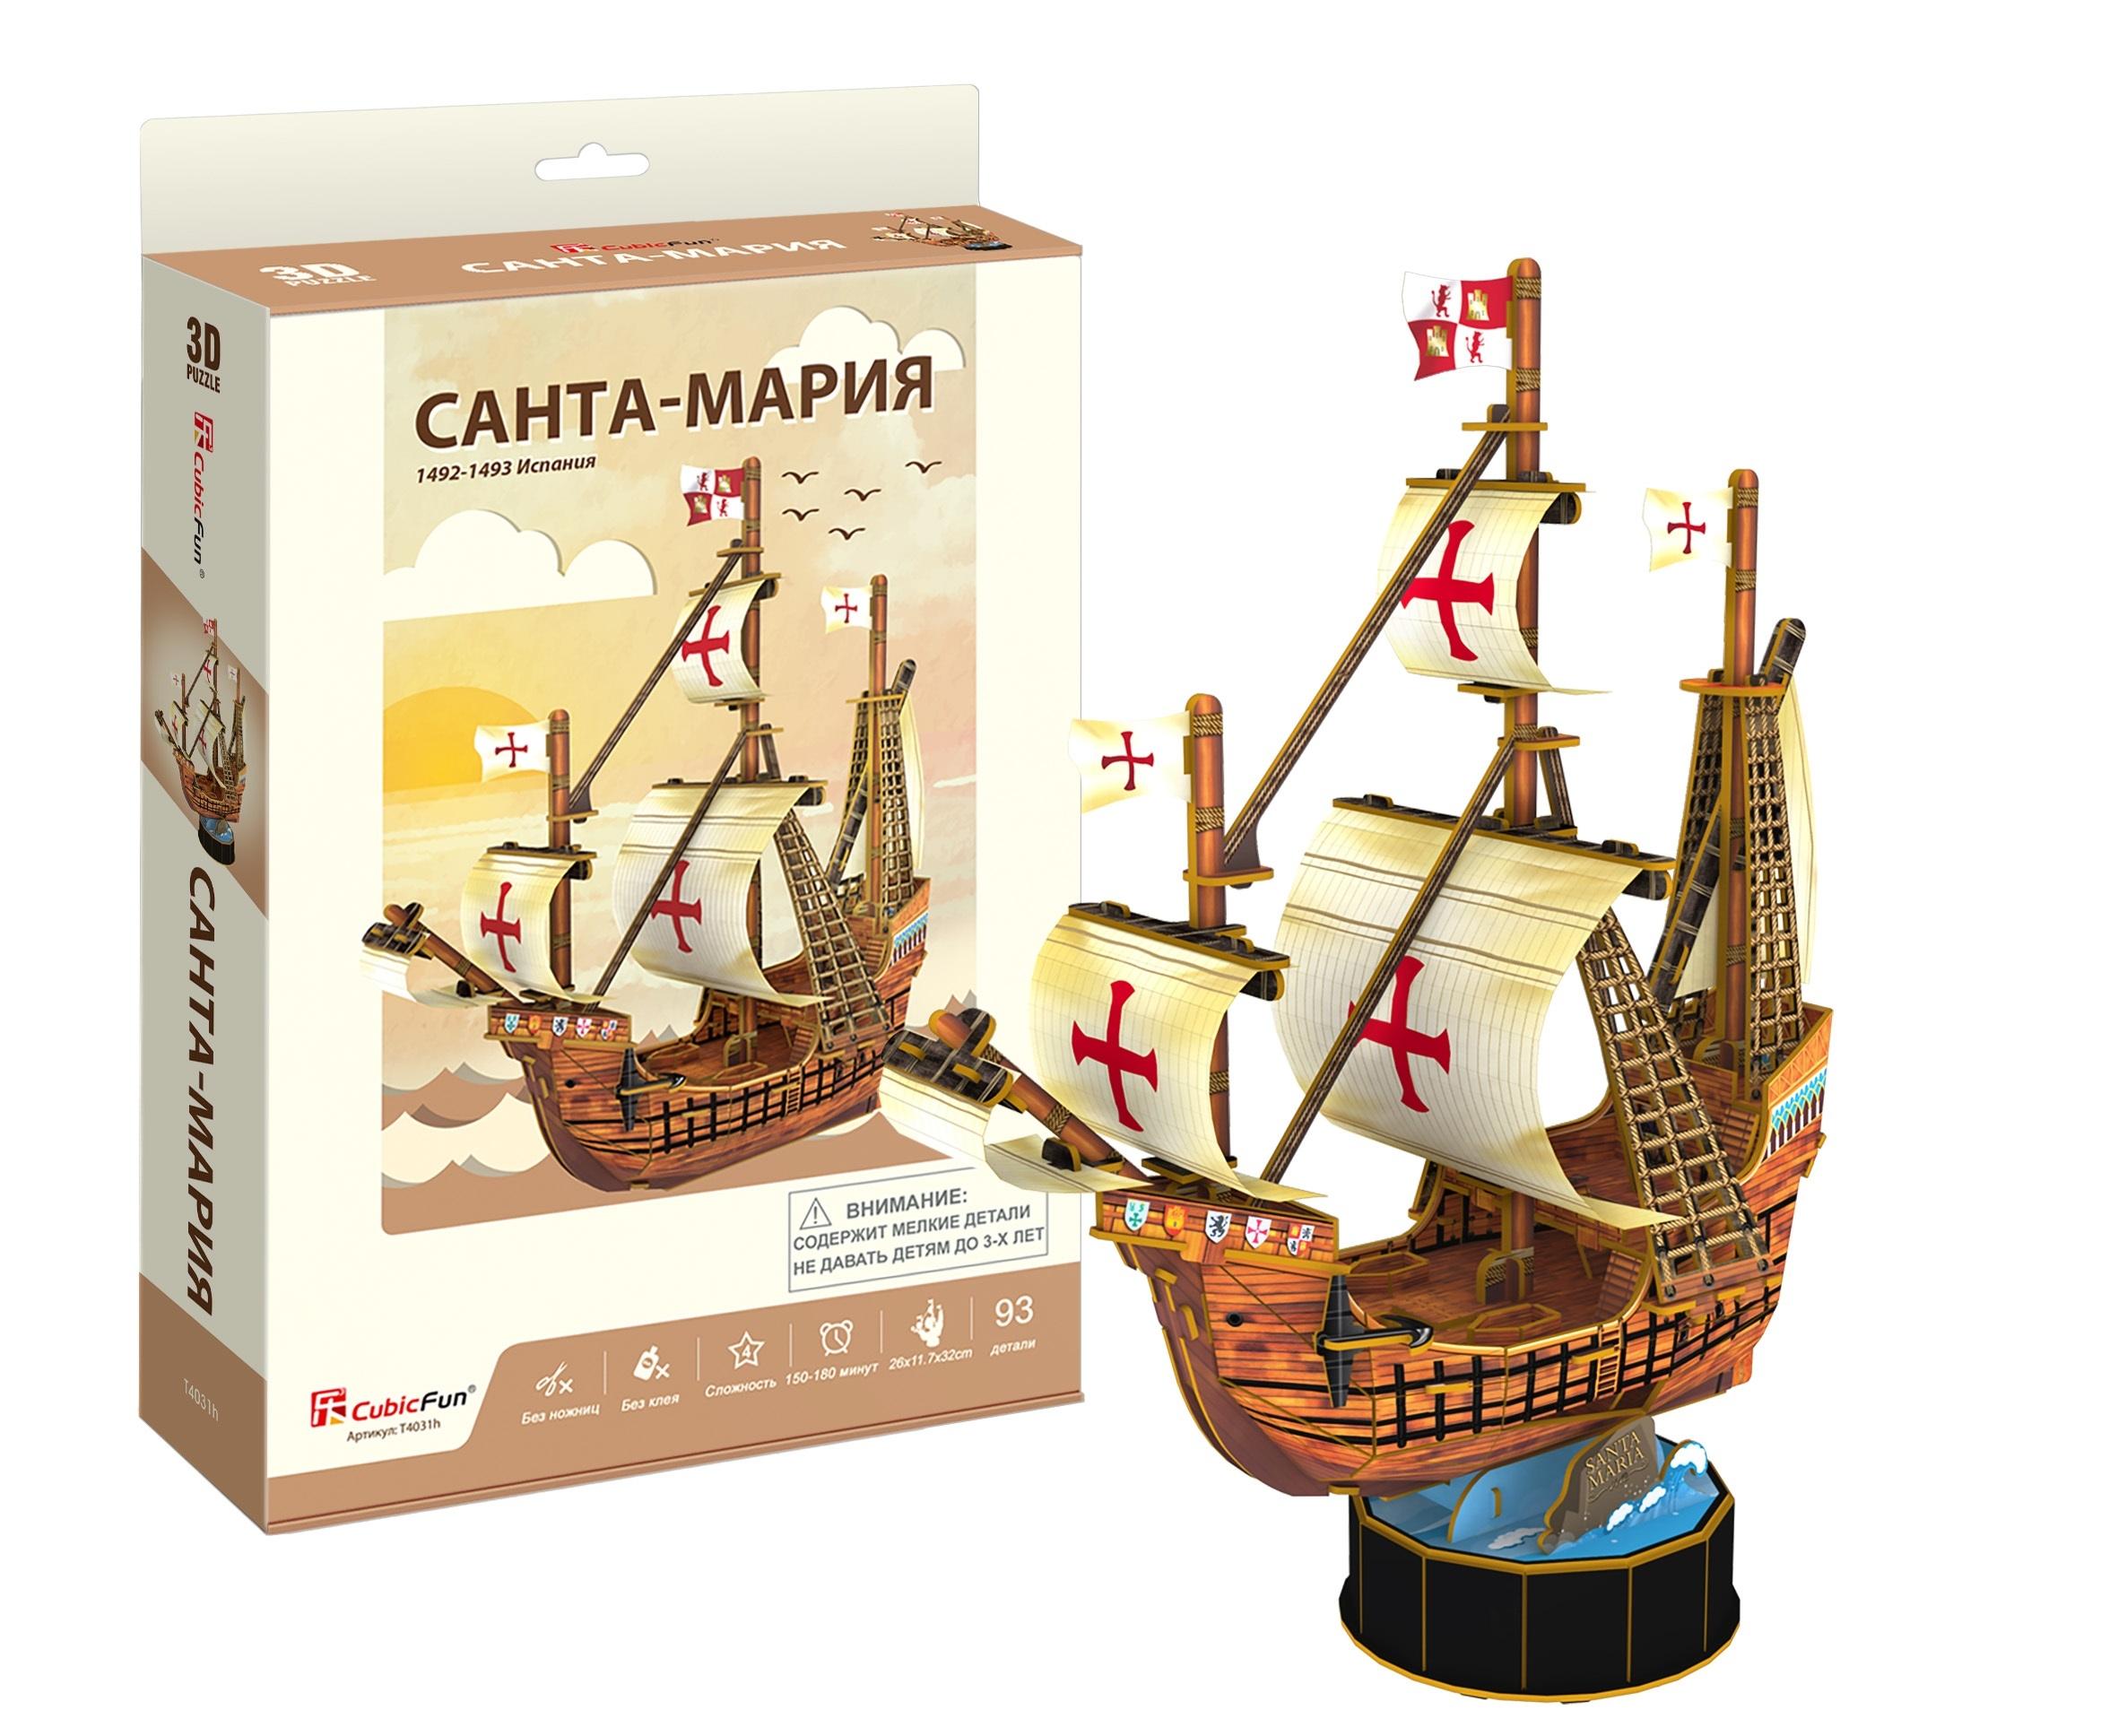 Пазлы CubicFun Корабль Санта Мария cubic fun t4008h кубик фан корабль санта мария